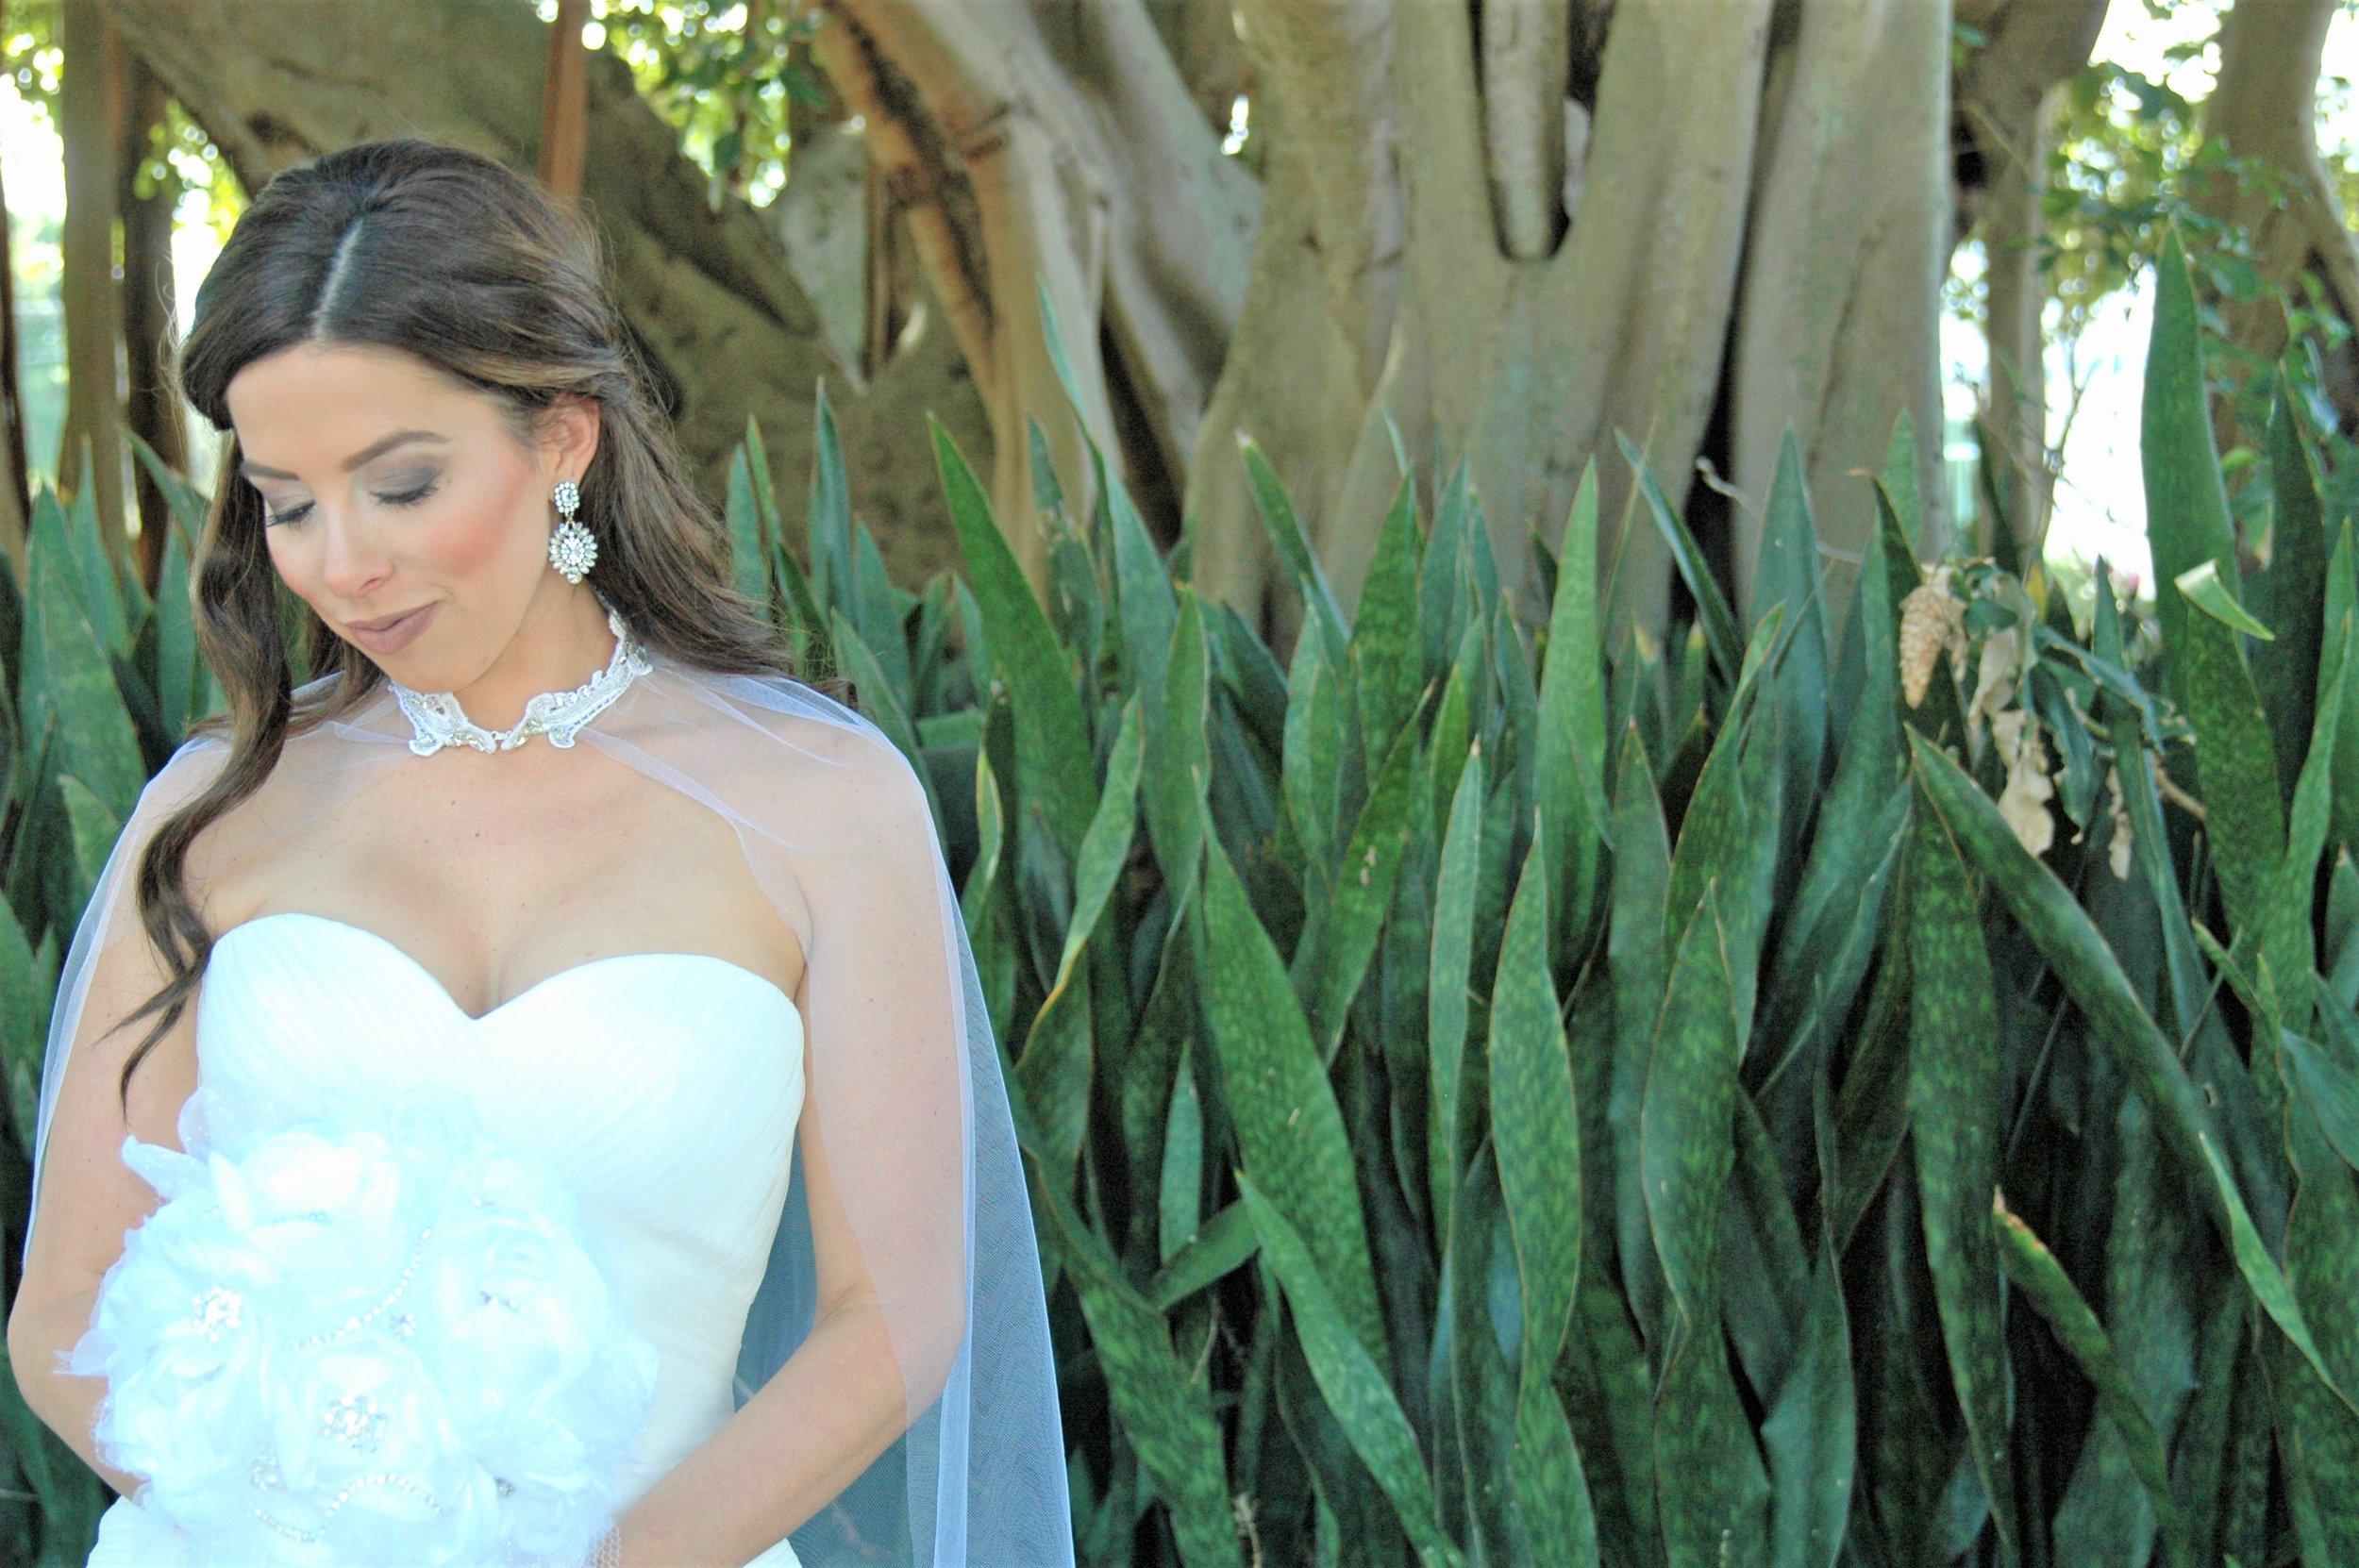 Bridal Accessories, Wedding Accessory, Modern bridal Cape, Bridal Veils, Wedding Veil Champagne and GRIT.jpg